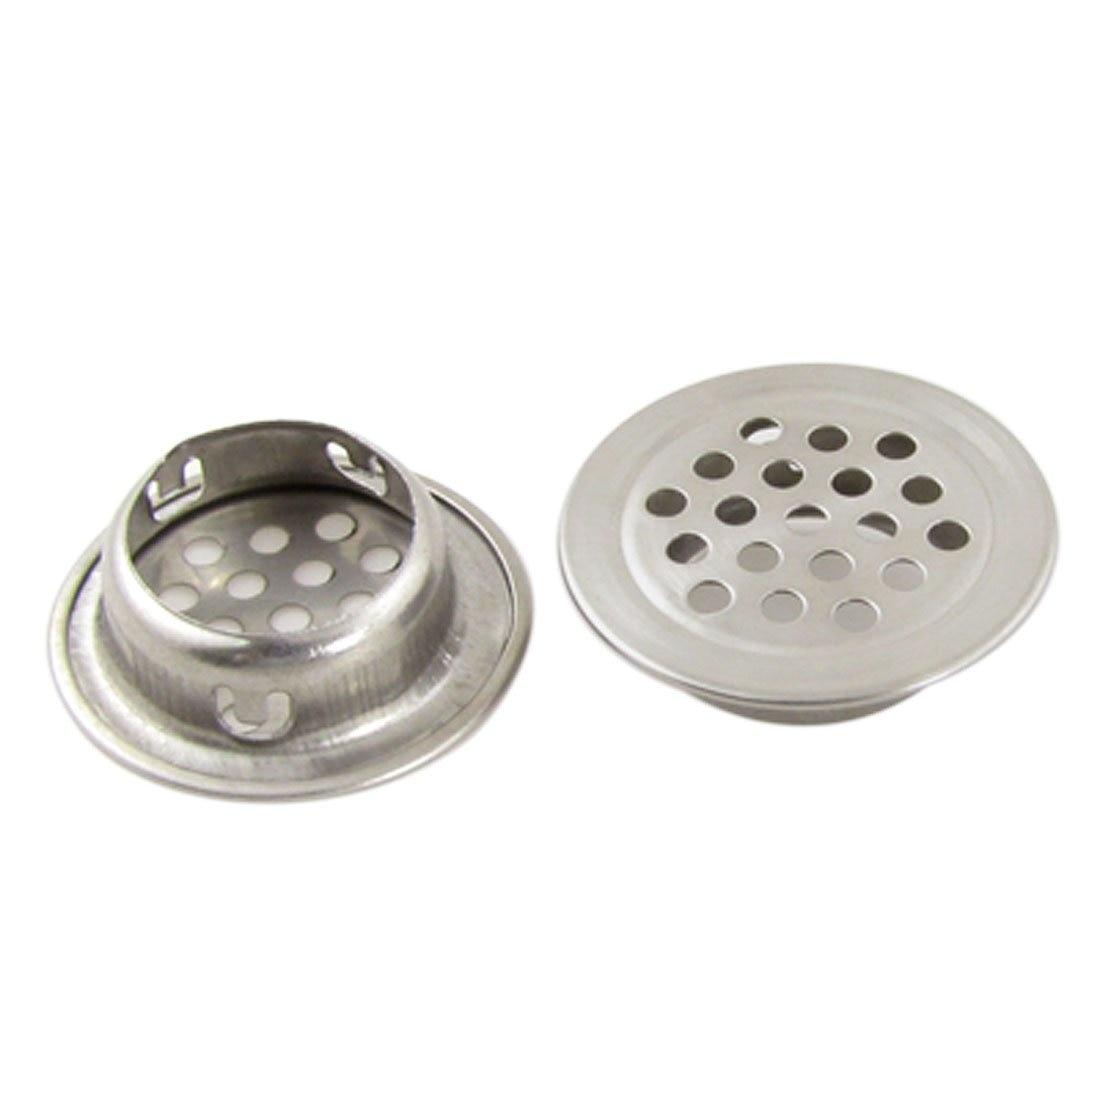 Wsfs Hot 2pcs Silver Stainless Steel 1 3 Top Diameter Kitchen Sink Basin Drain Strainer